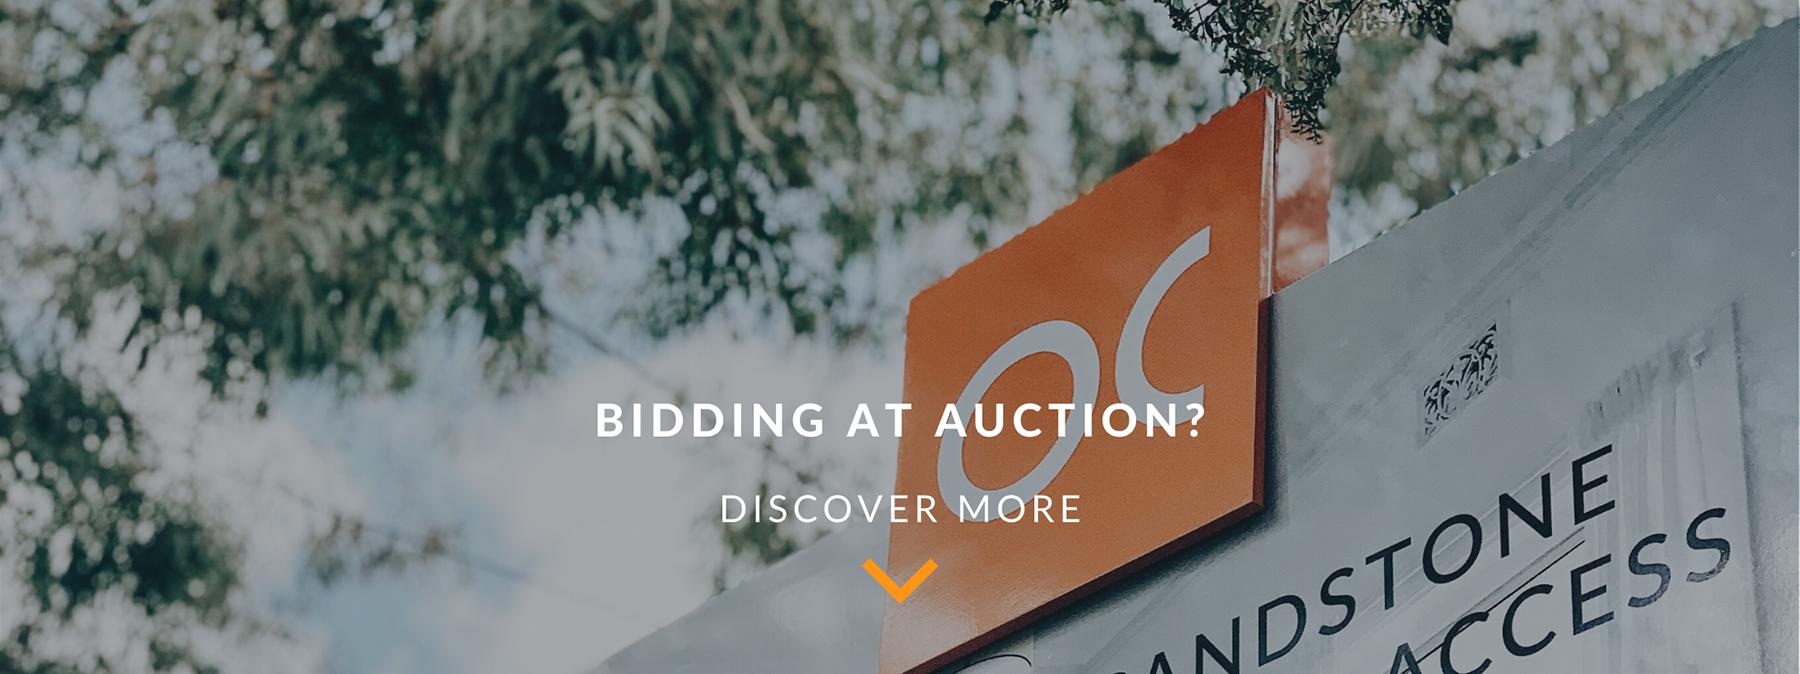 Auction bidders header image web